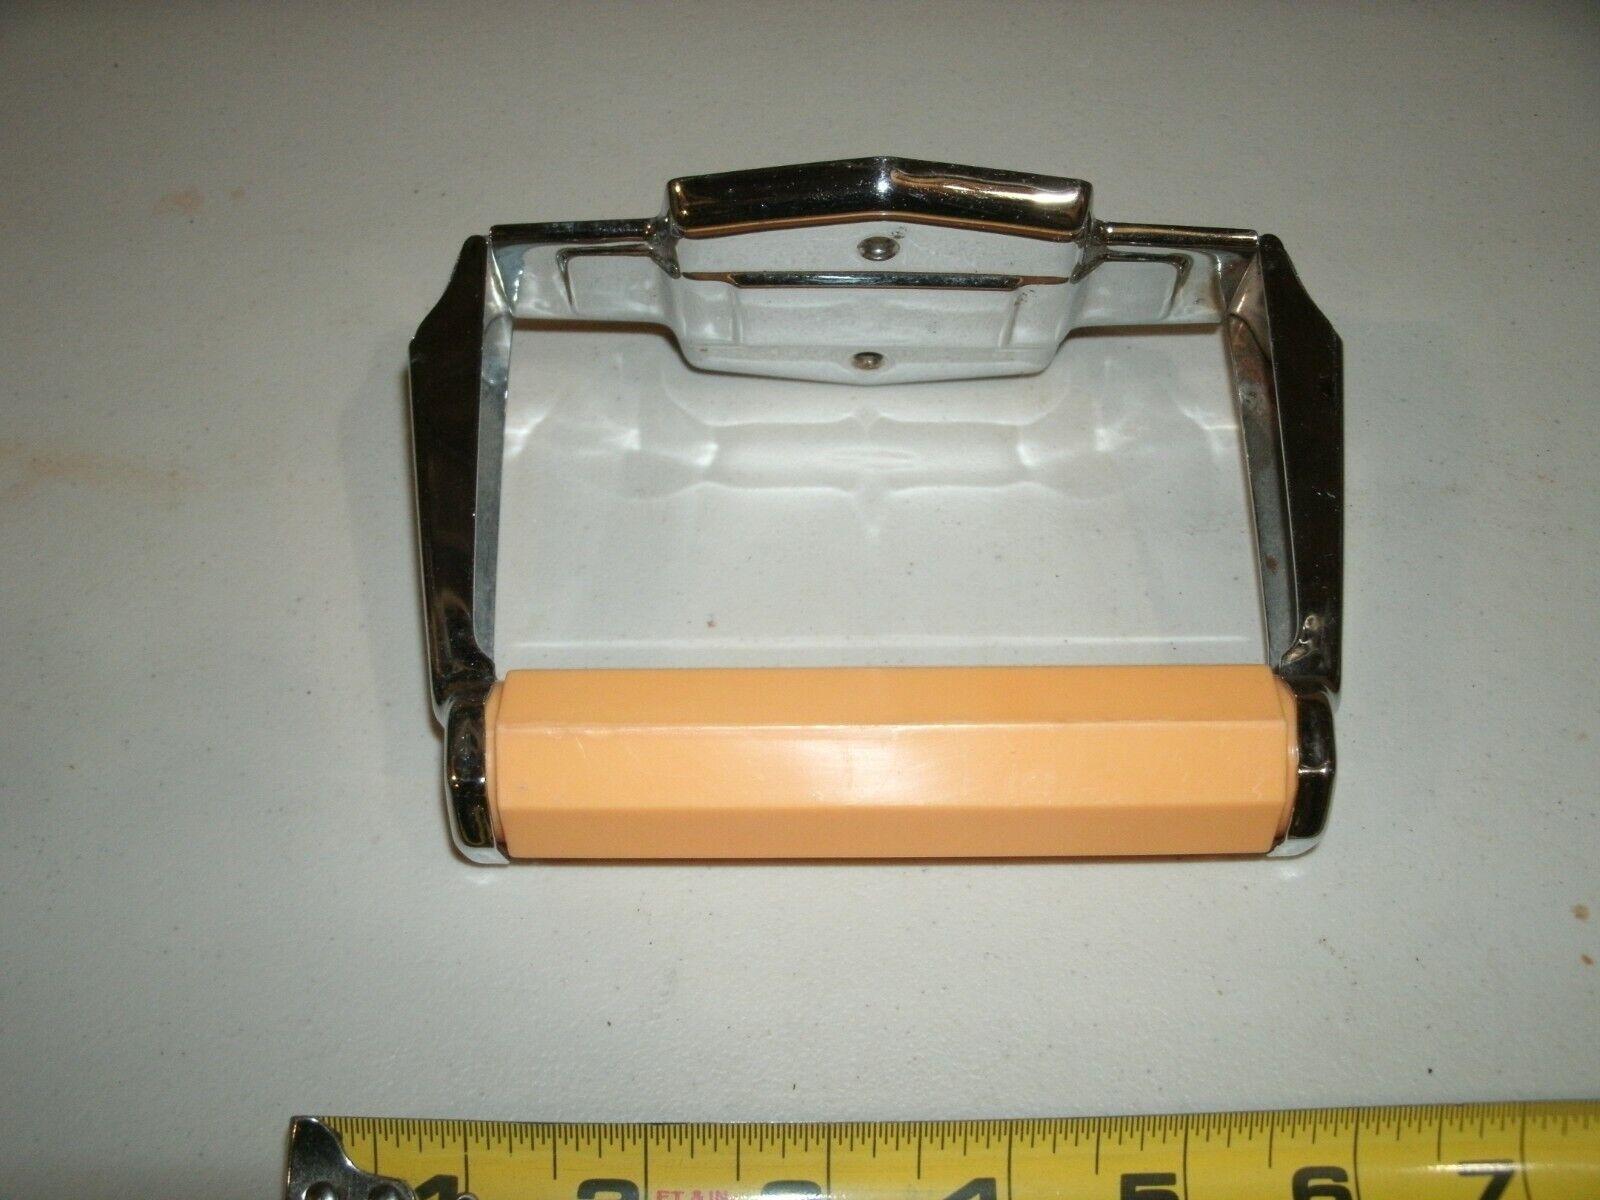 Vintage Chrome Tissue Paper Holder Autoyre Fairfield USA 56 Deco Design - $14.50